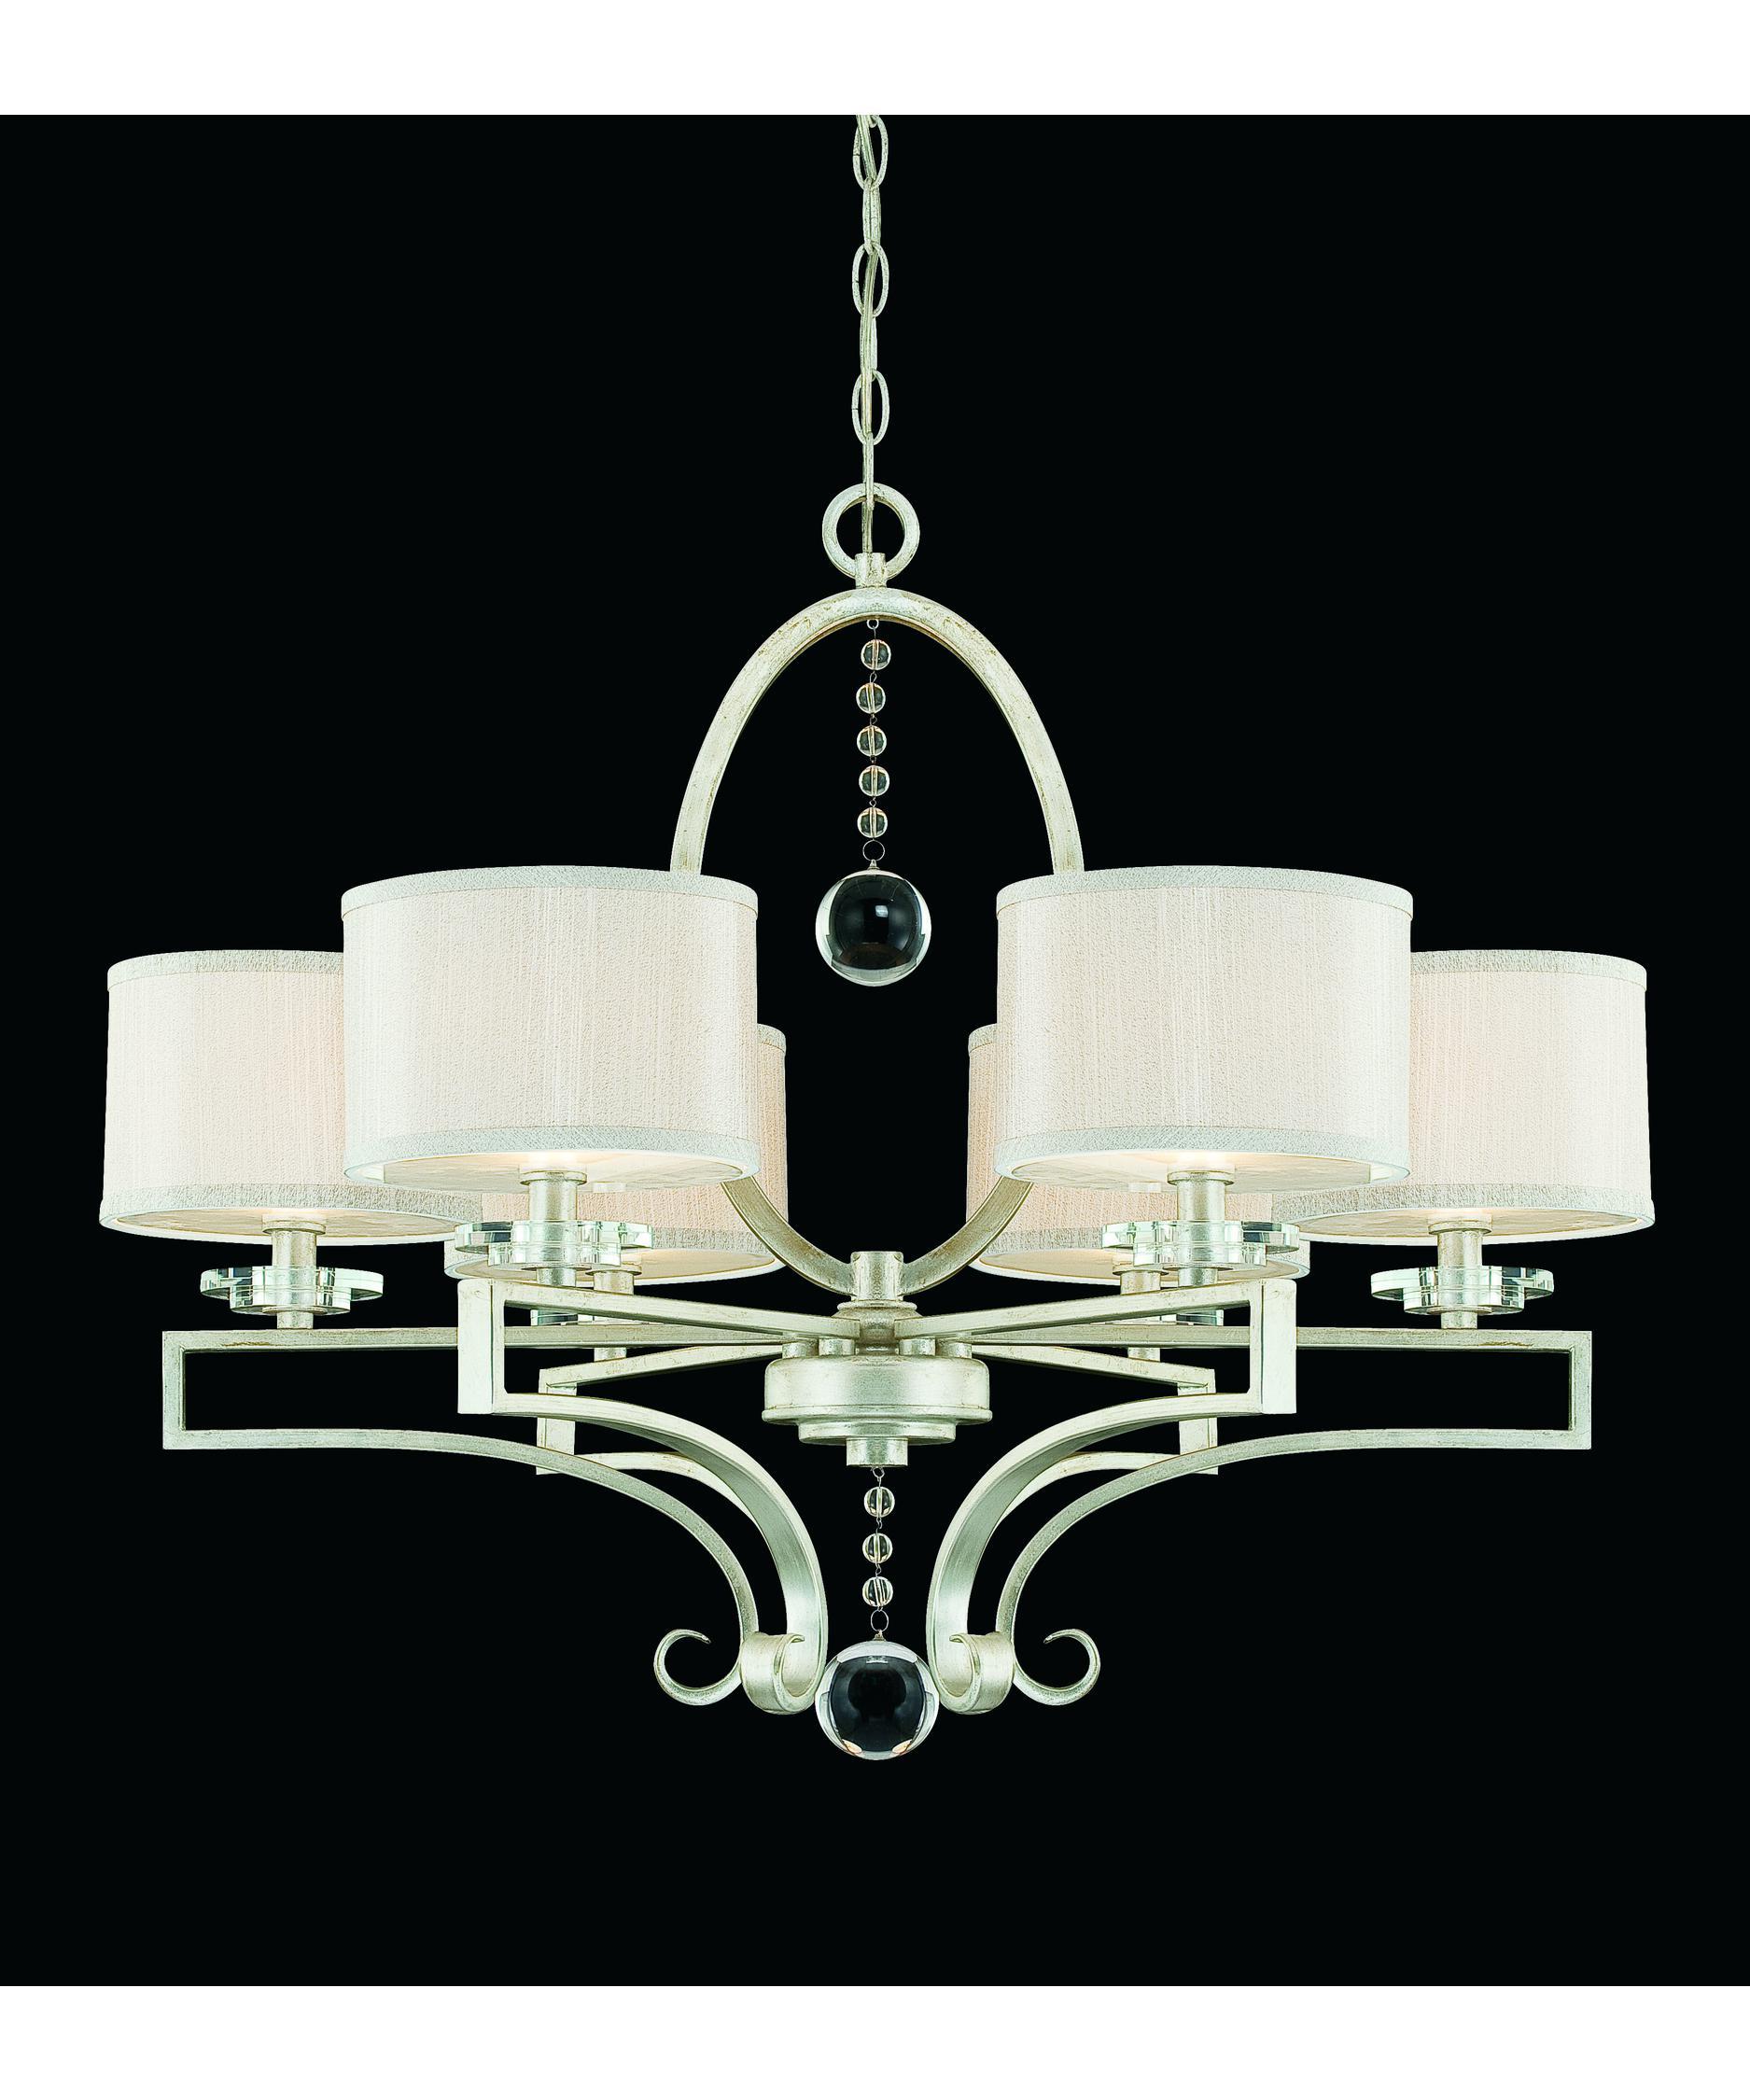 Savoy House Rosendal 30 Inch Wide 6 Light Chandelier – Chandelier Floor Lamp Closeout